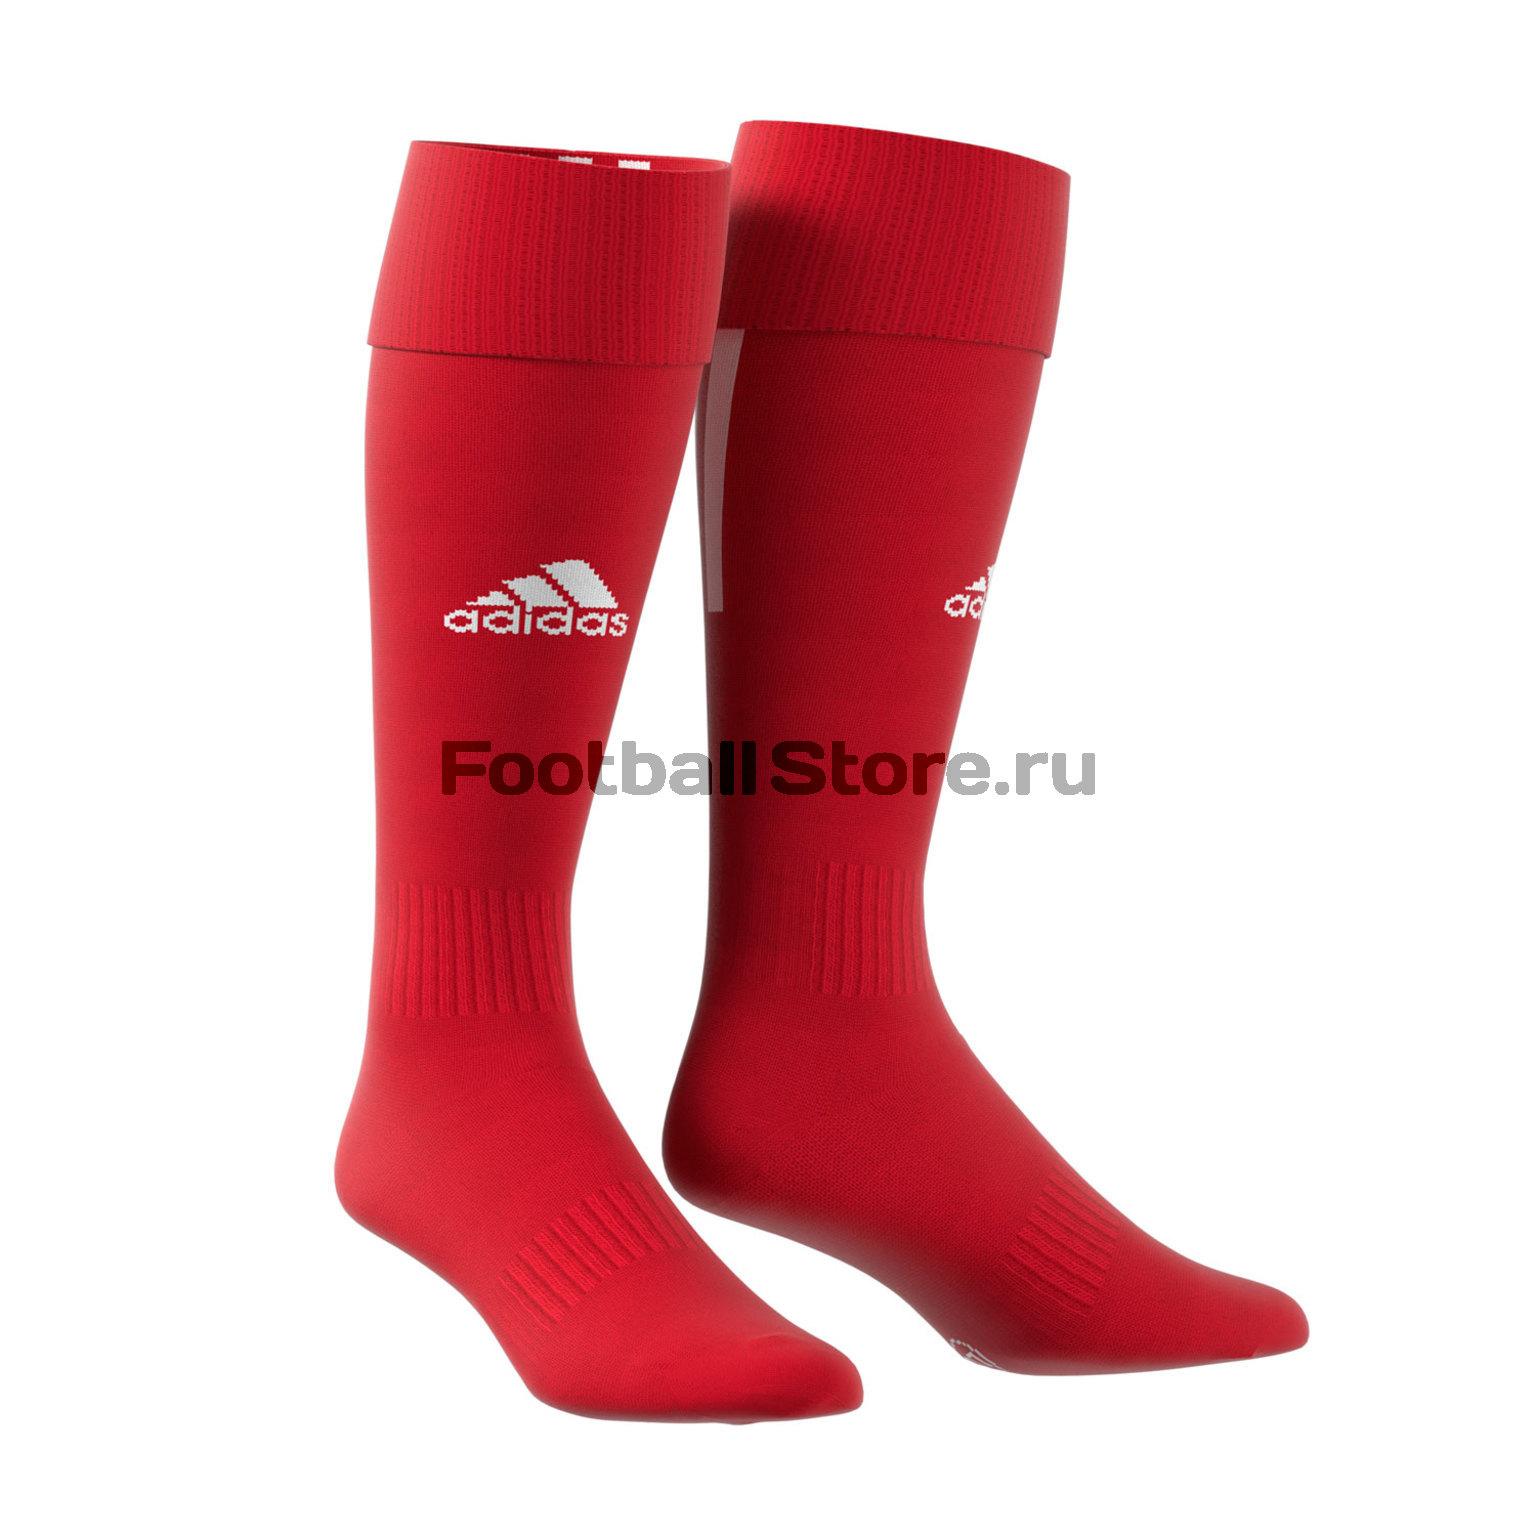 Гетры Adidas Santos Sock 18 CV8096 200 1000pcs pack ndfeb countersunk magnet dia 10x3 mm thick m3 screw countersunk hole n42 neodymium rare earth permanent magnet